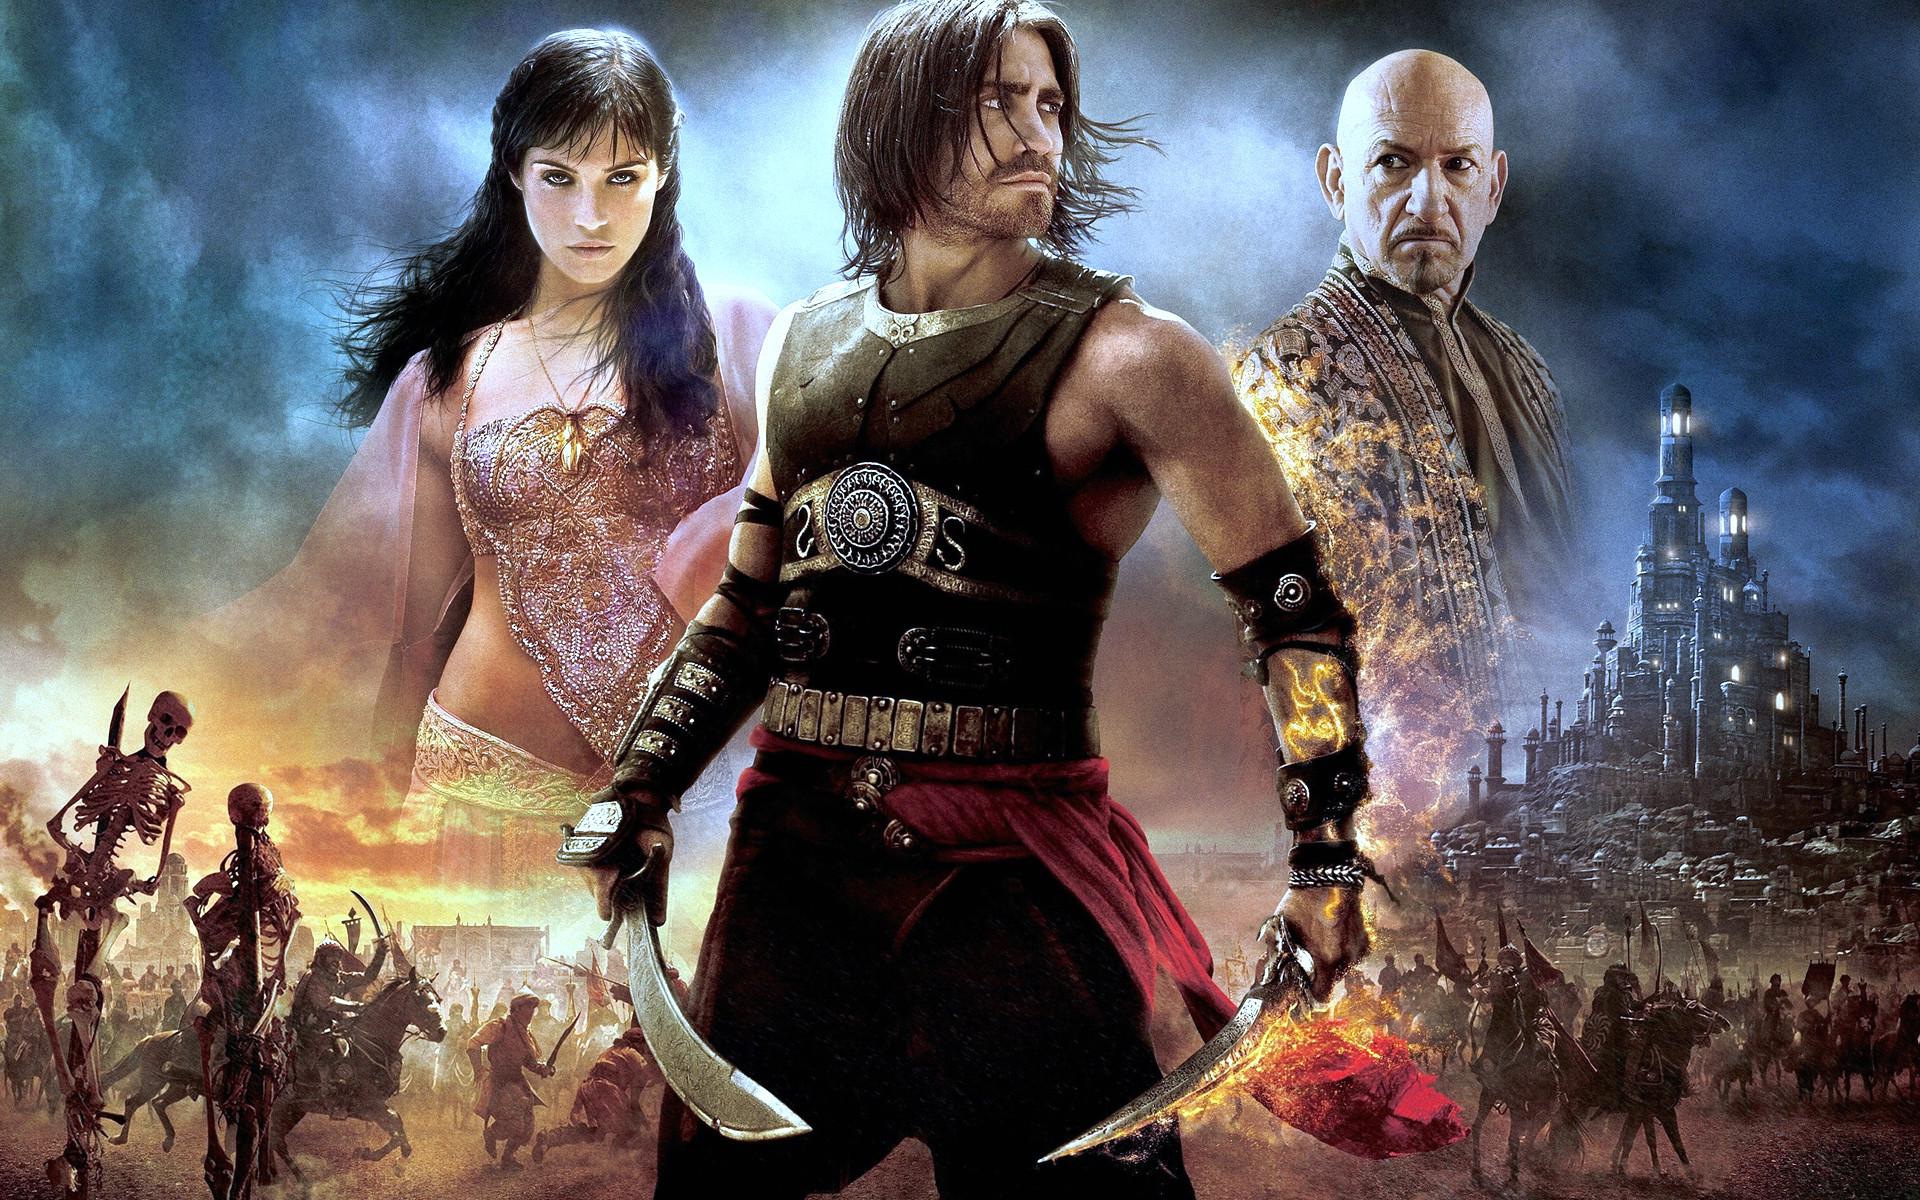 Prince of Persia fantasy movies wallpaper | 1680x1050 ... |Prince Of Persia Movie Wallpapers